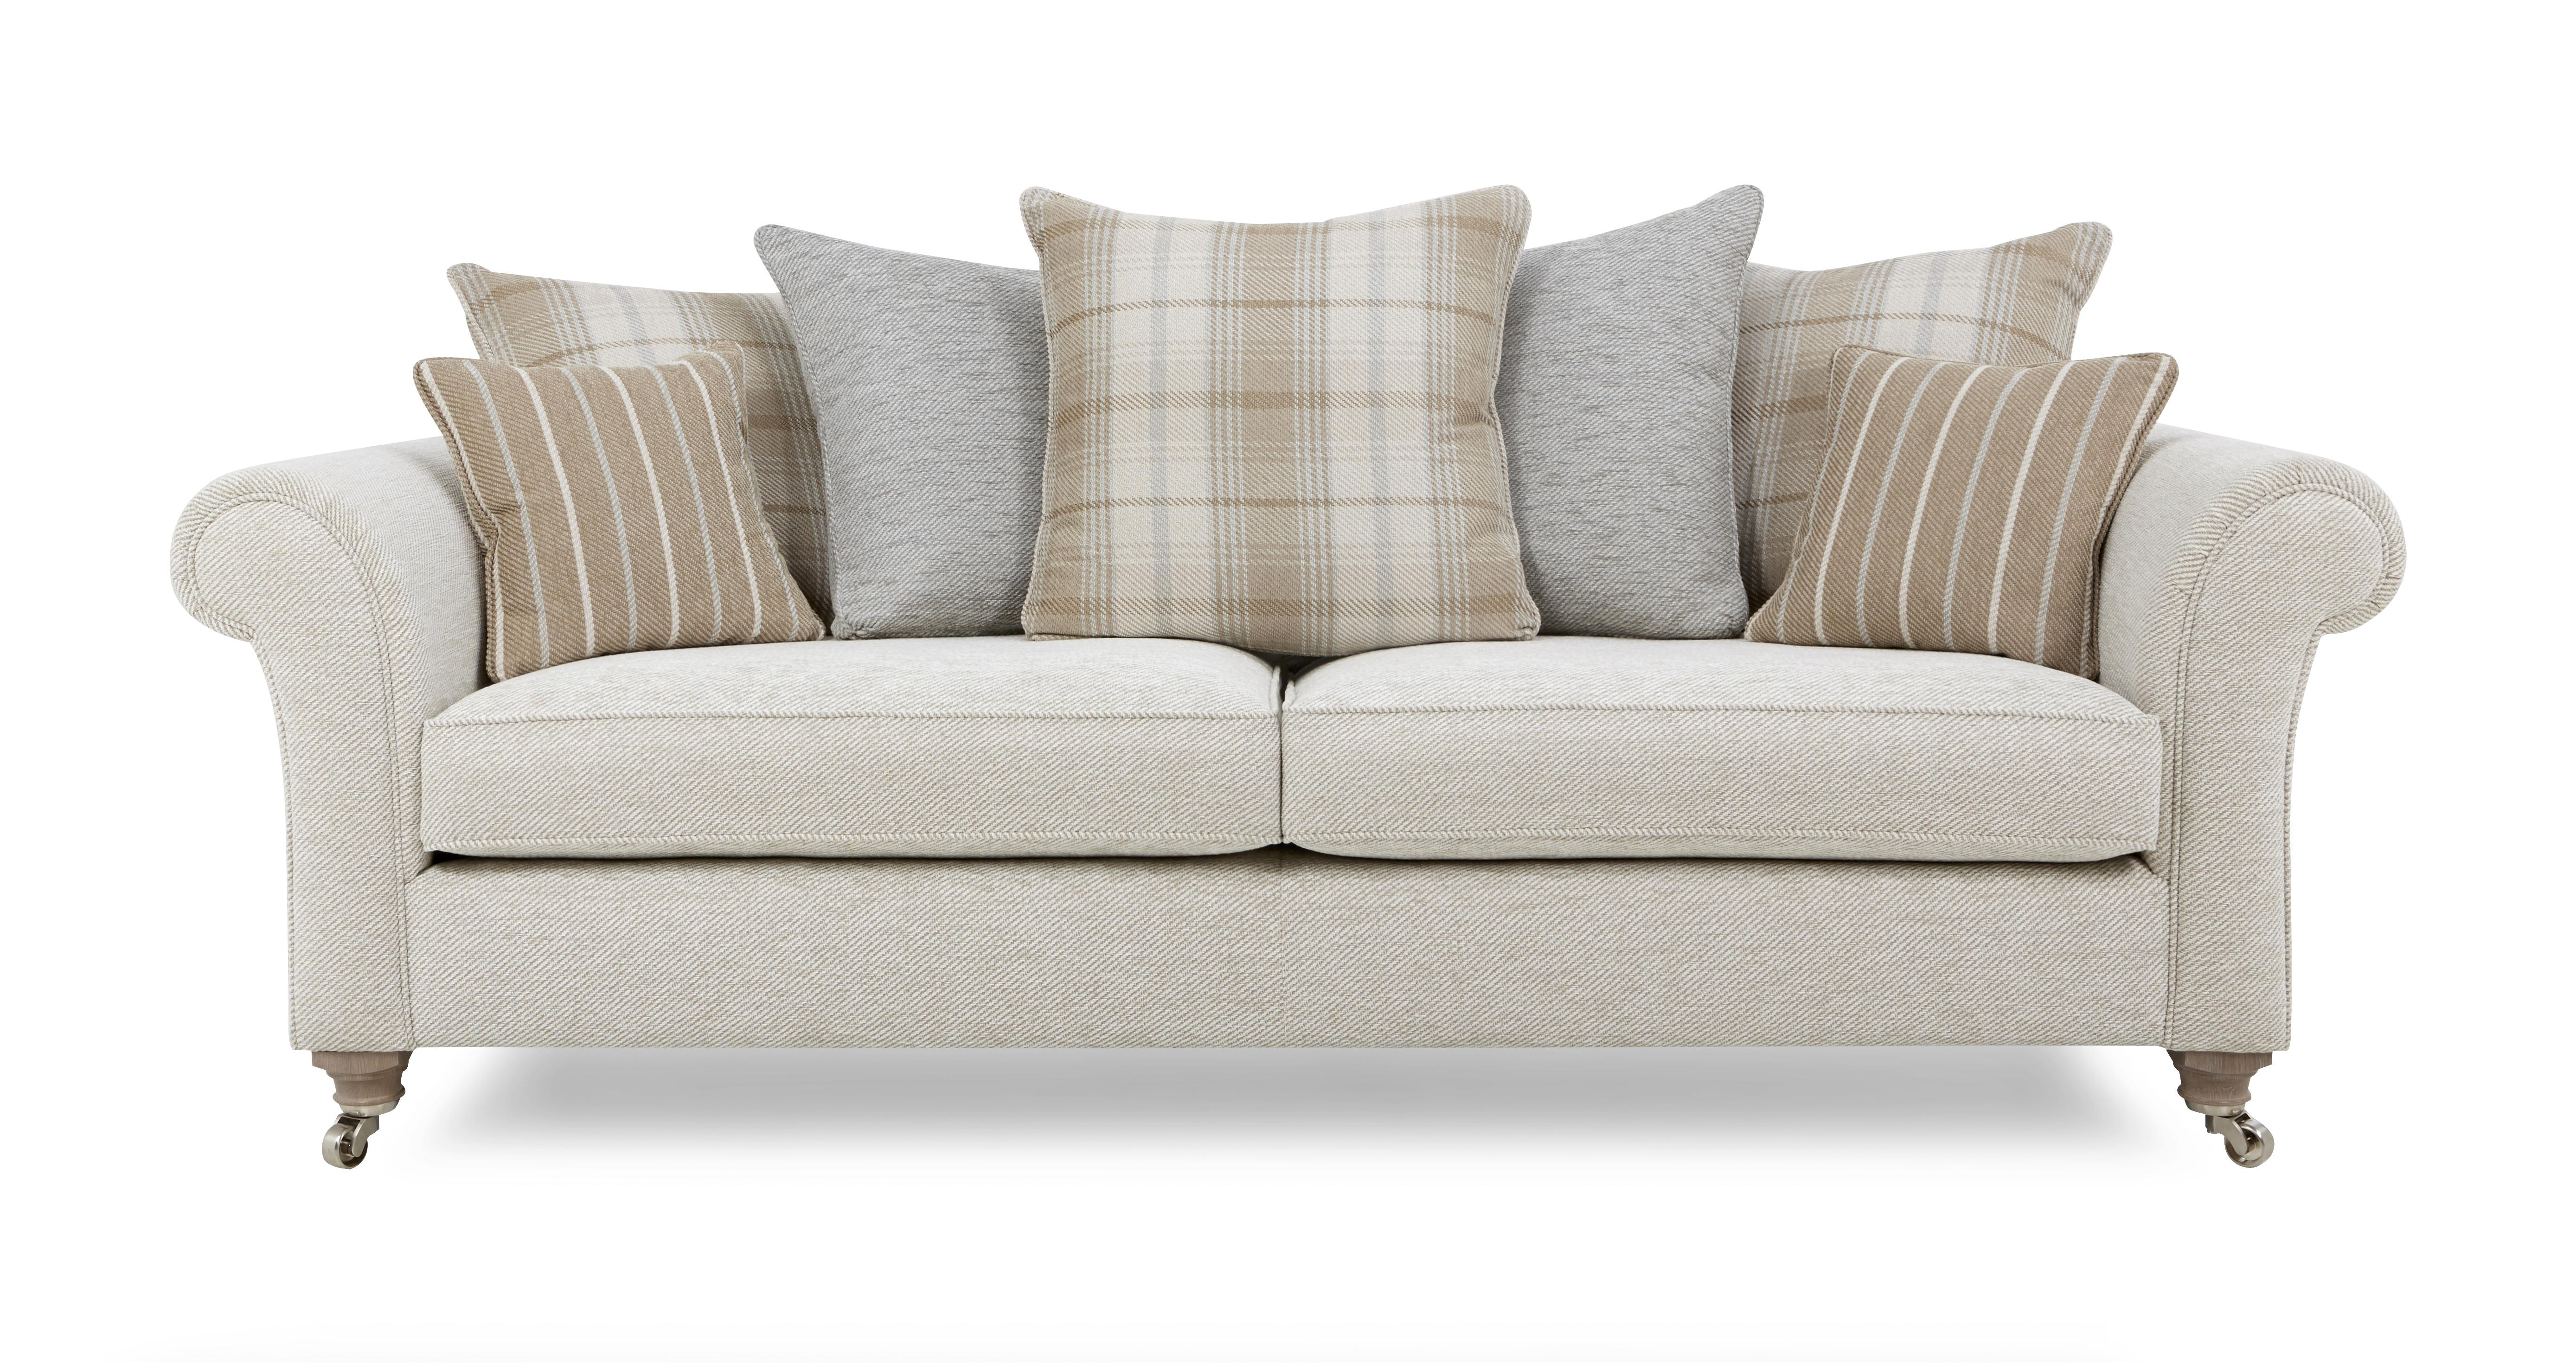 Morland Plain Body 4 Seater Pillow Back Sofa